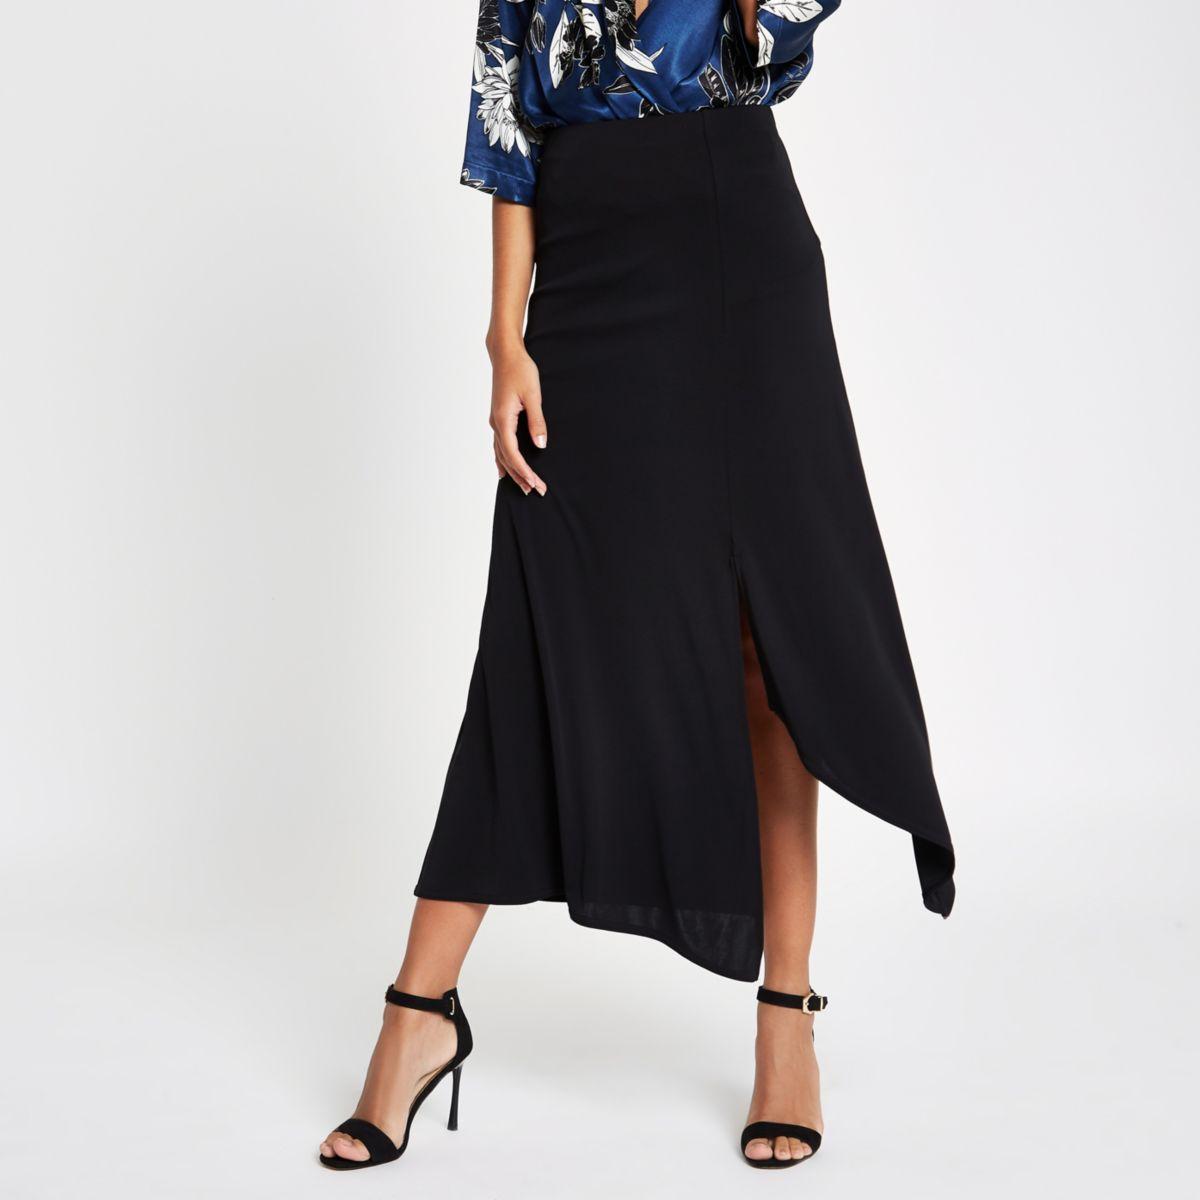 Black jersey midi skirt